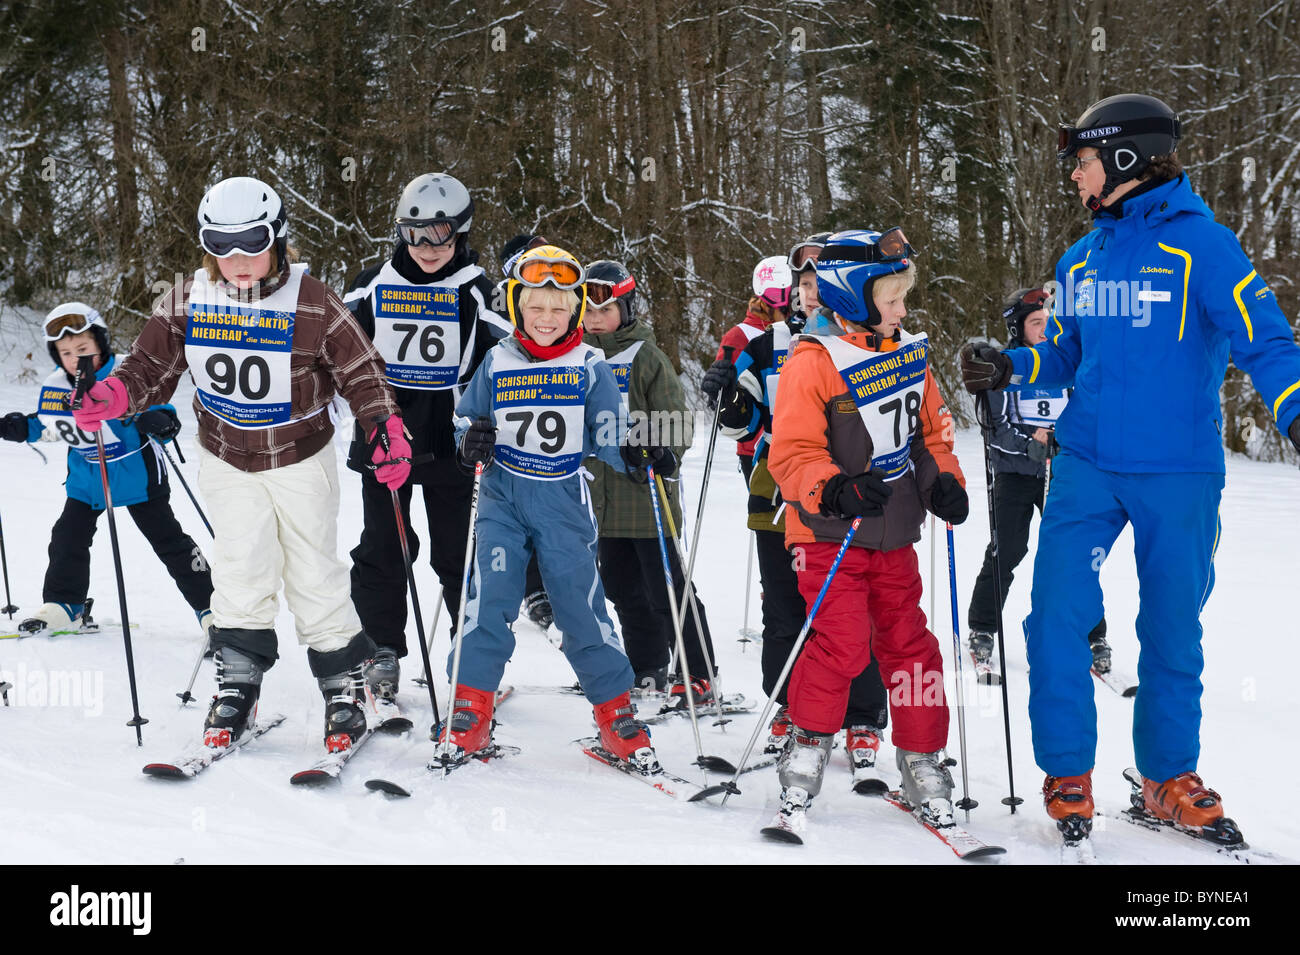 Children with instructor attending a ski course in Niederau in Austria - Stock Image